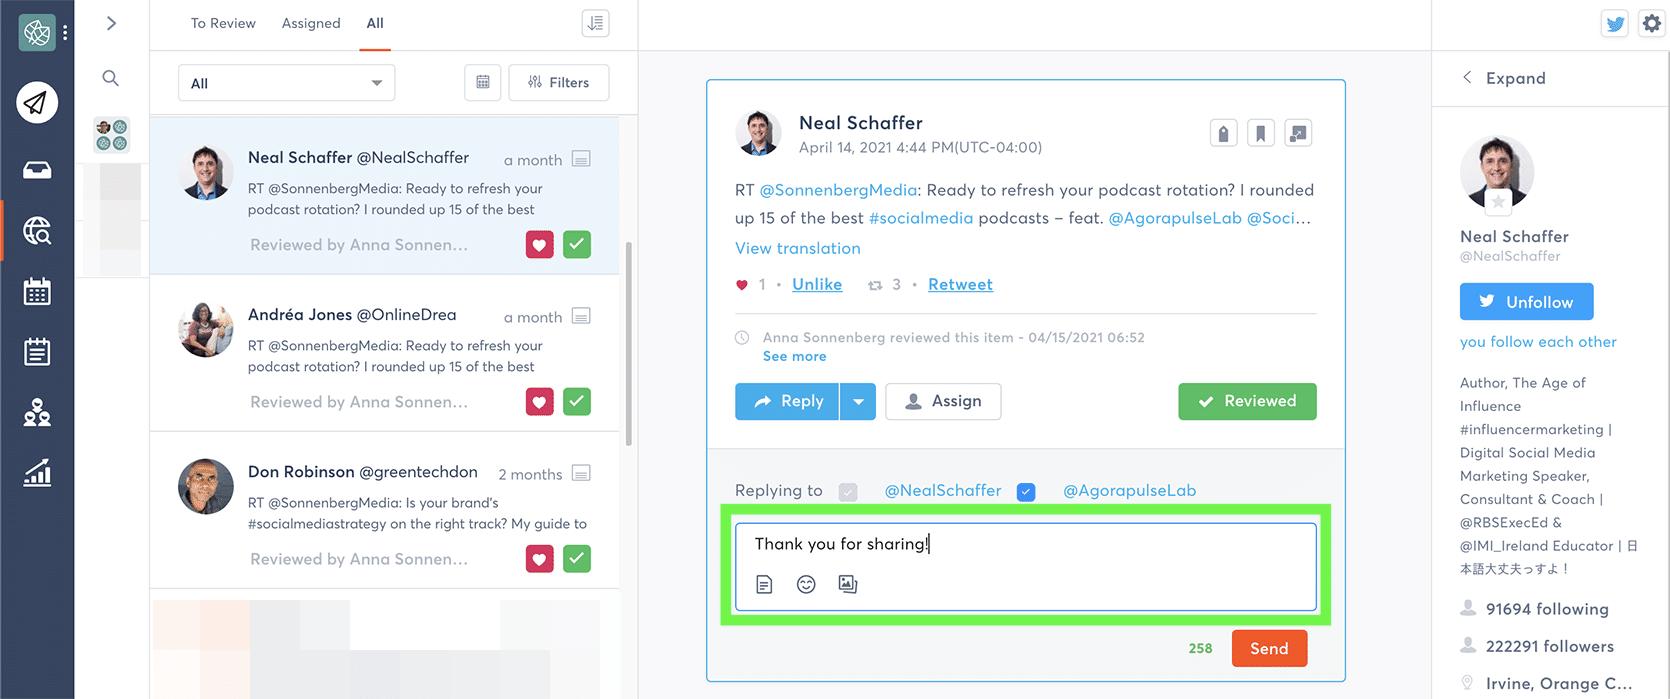 Agorapulse - how to respond to brand mentions